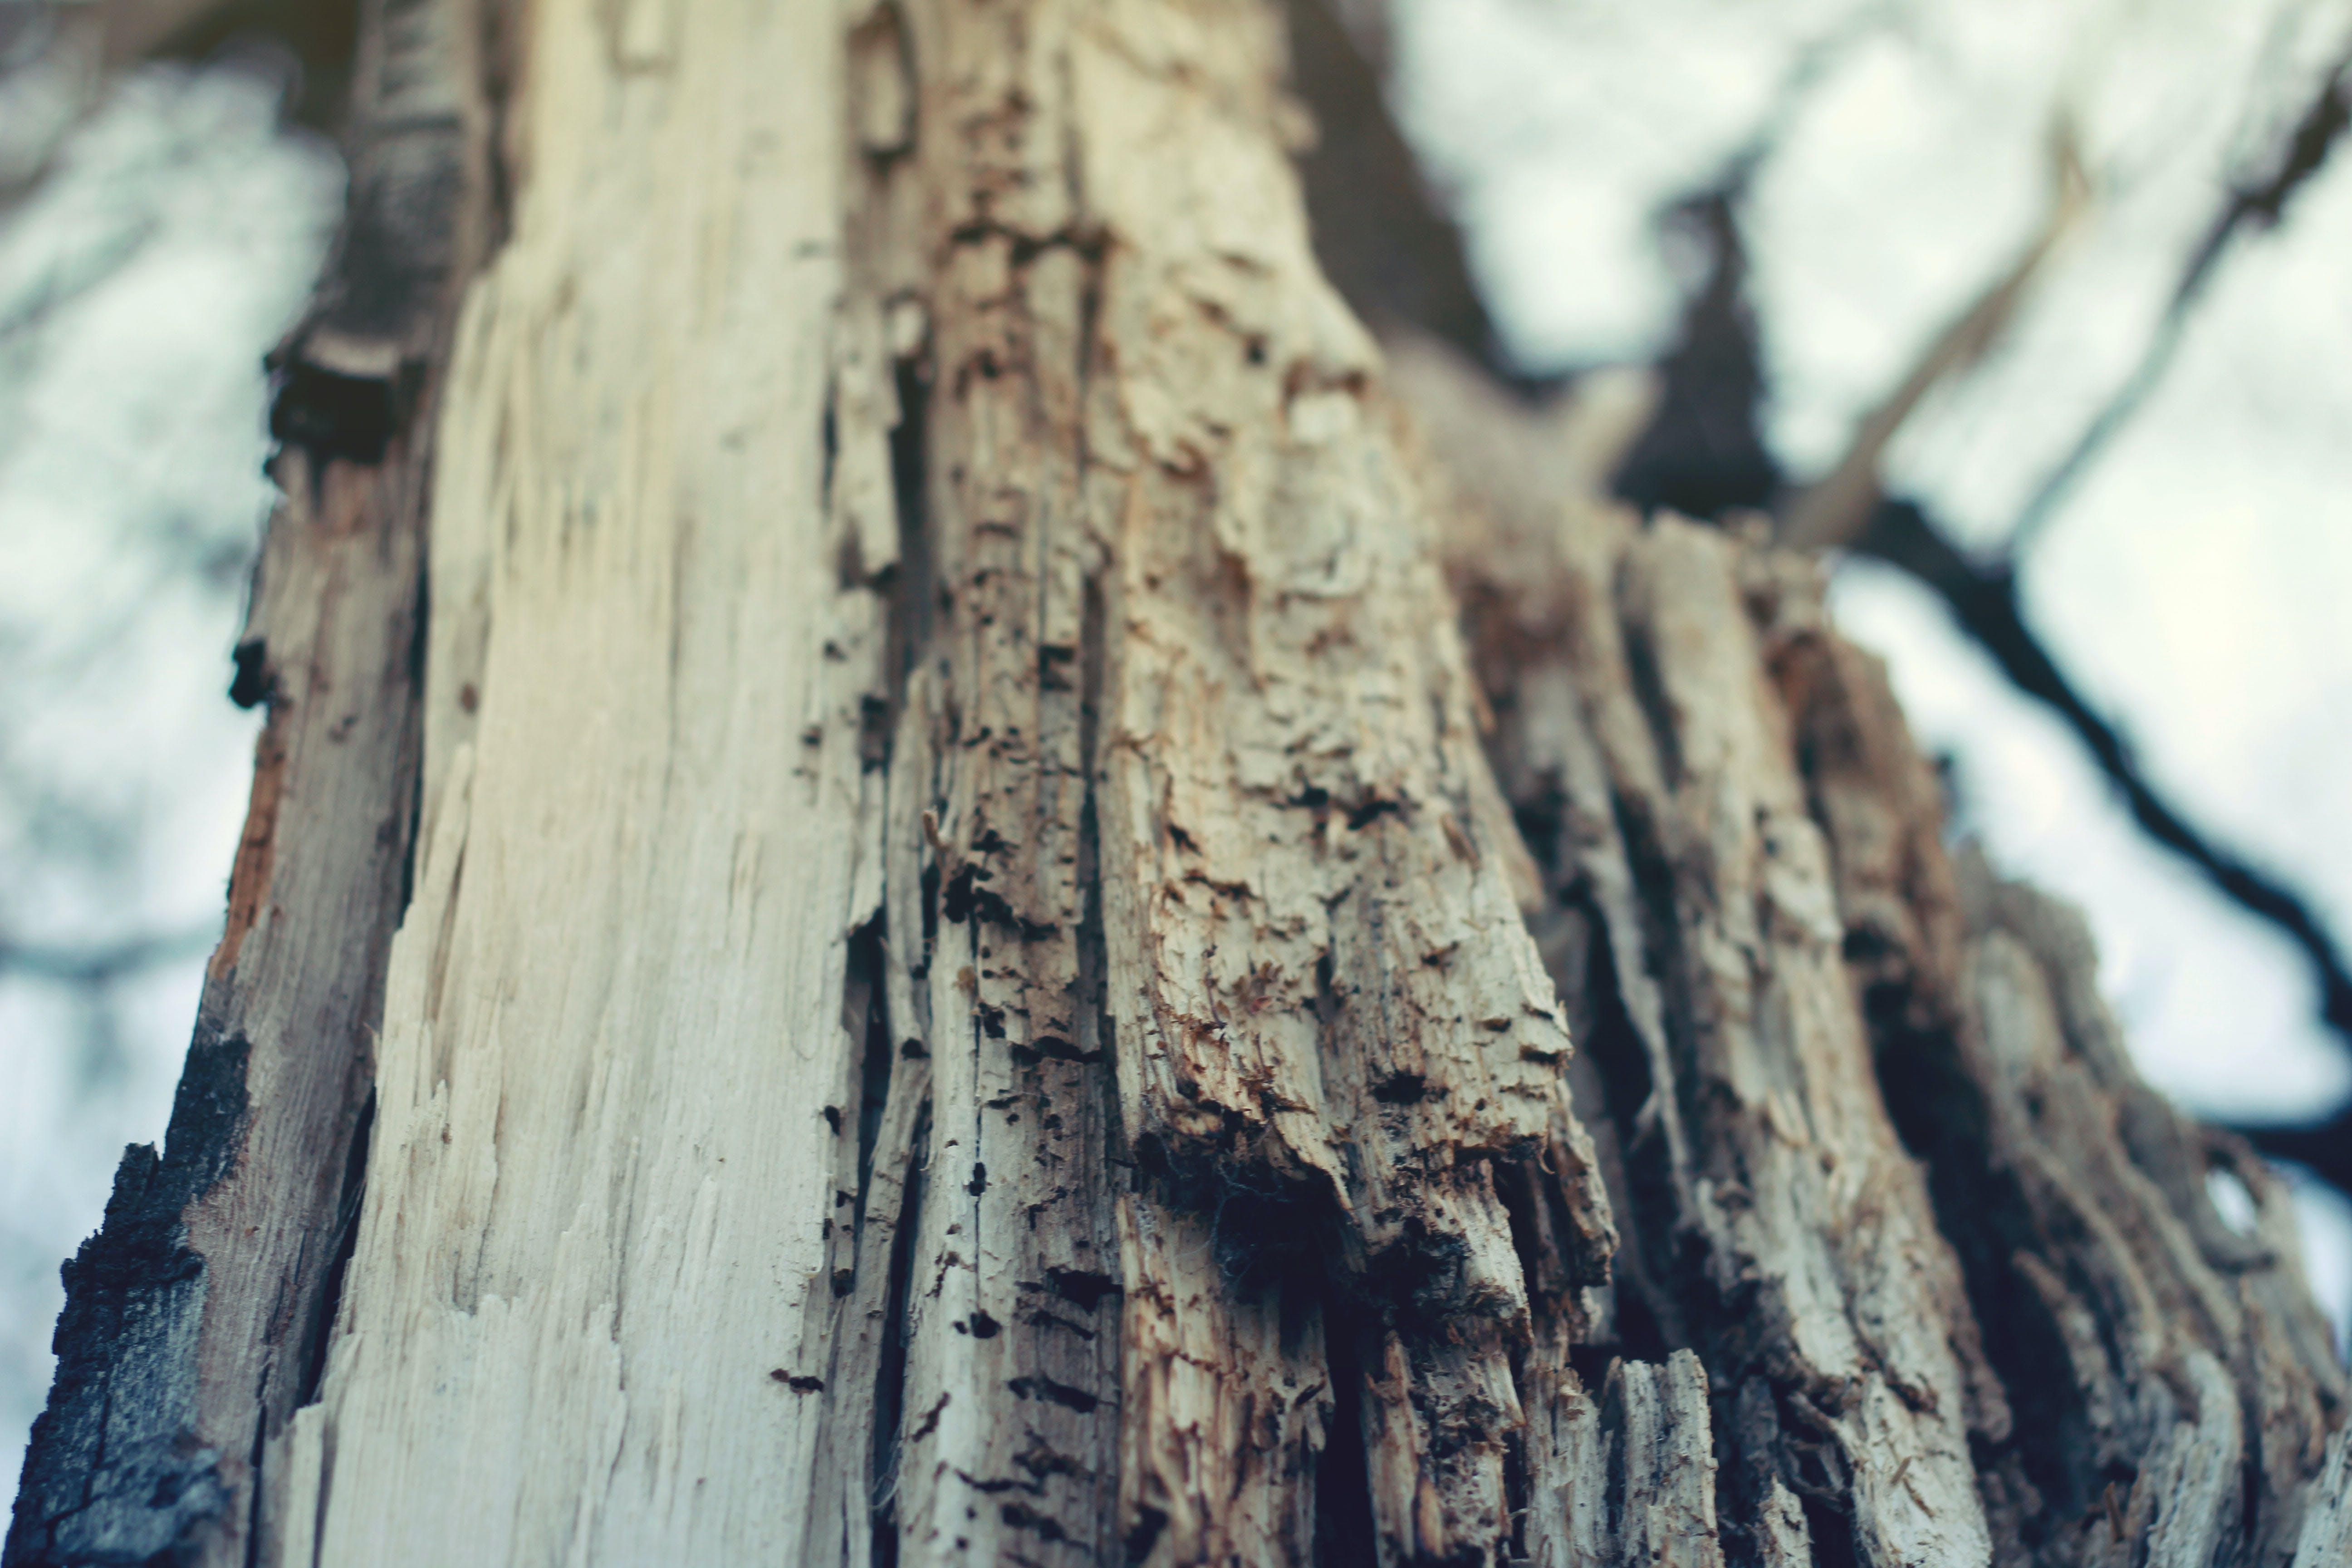 Closeup Photography of Bare Tree